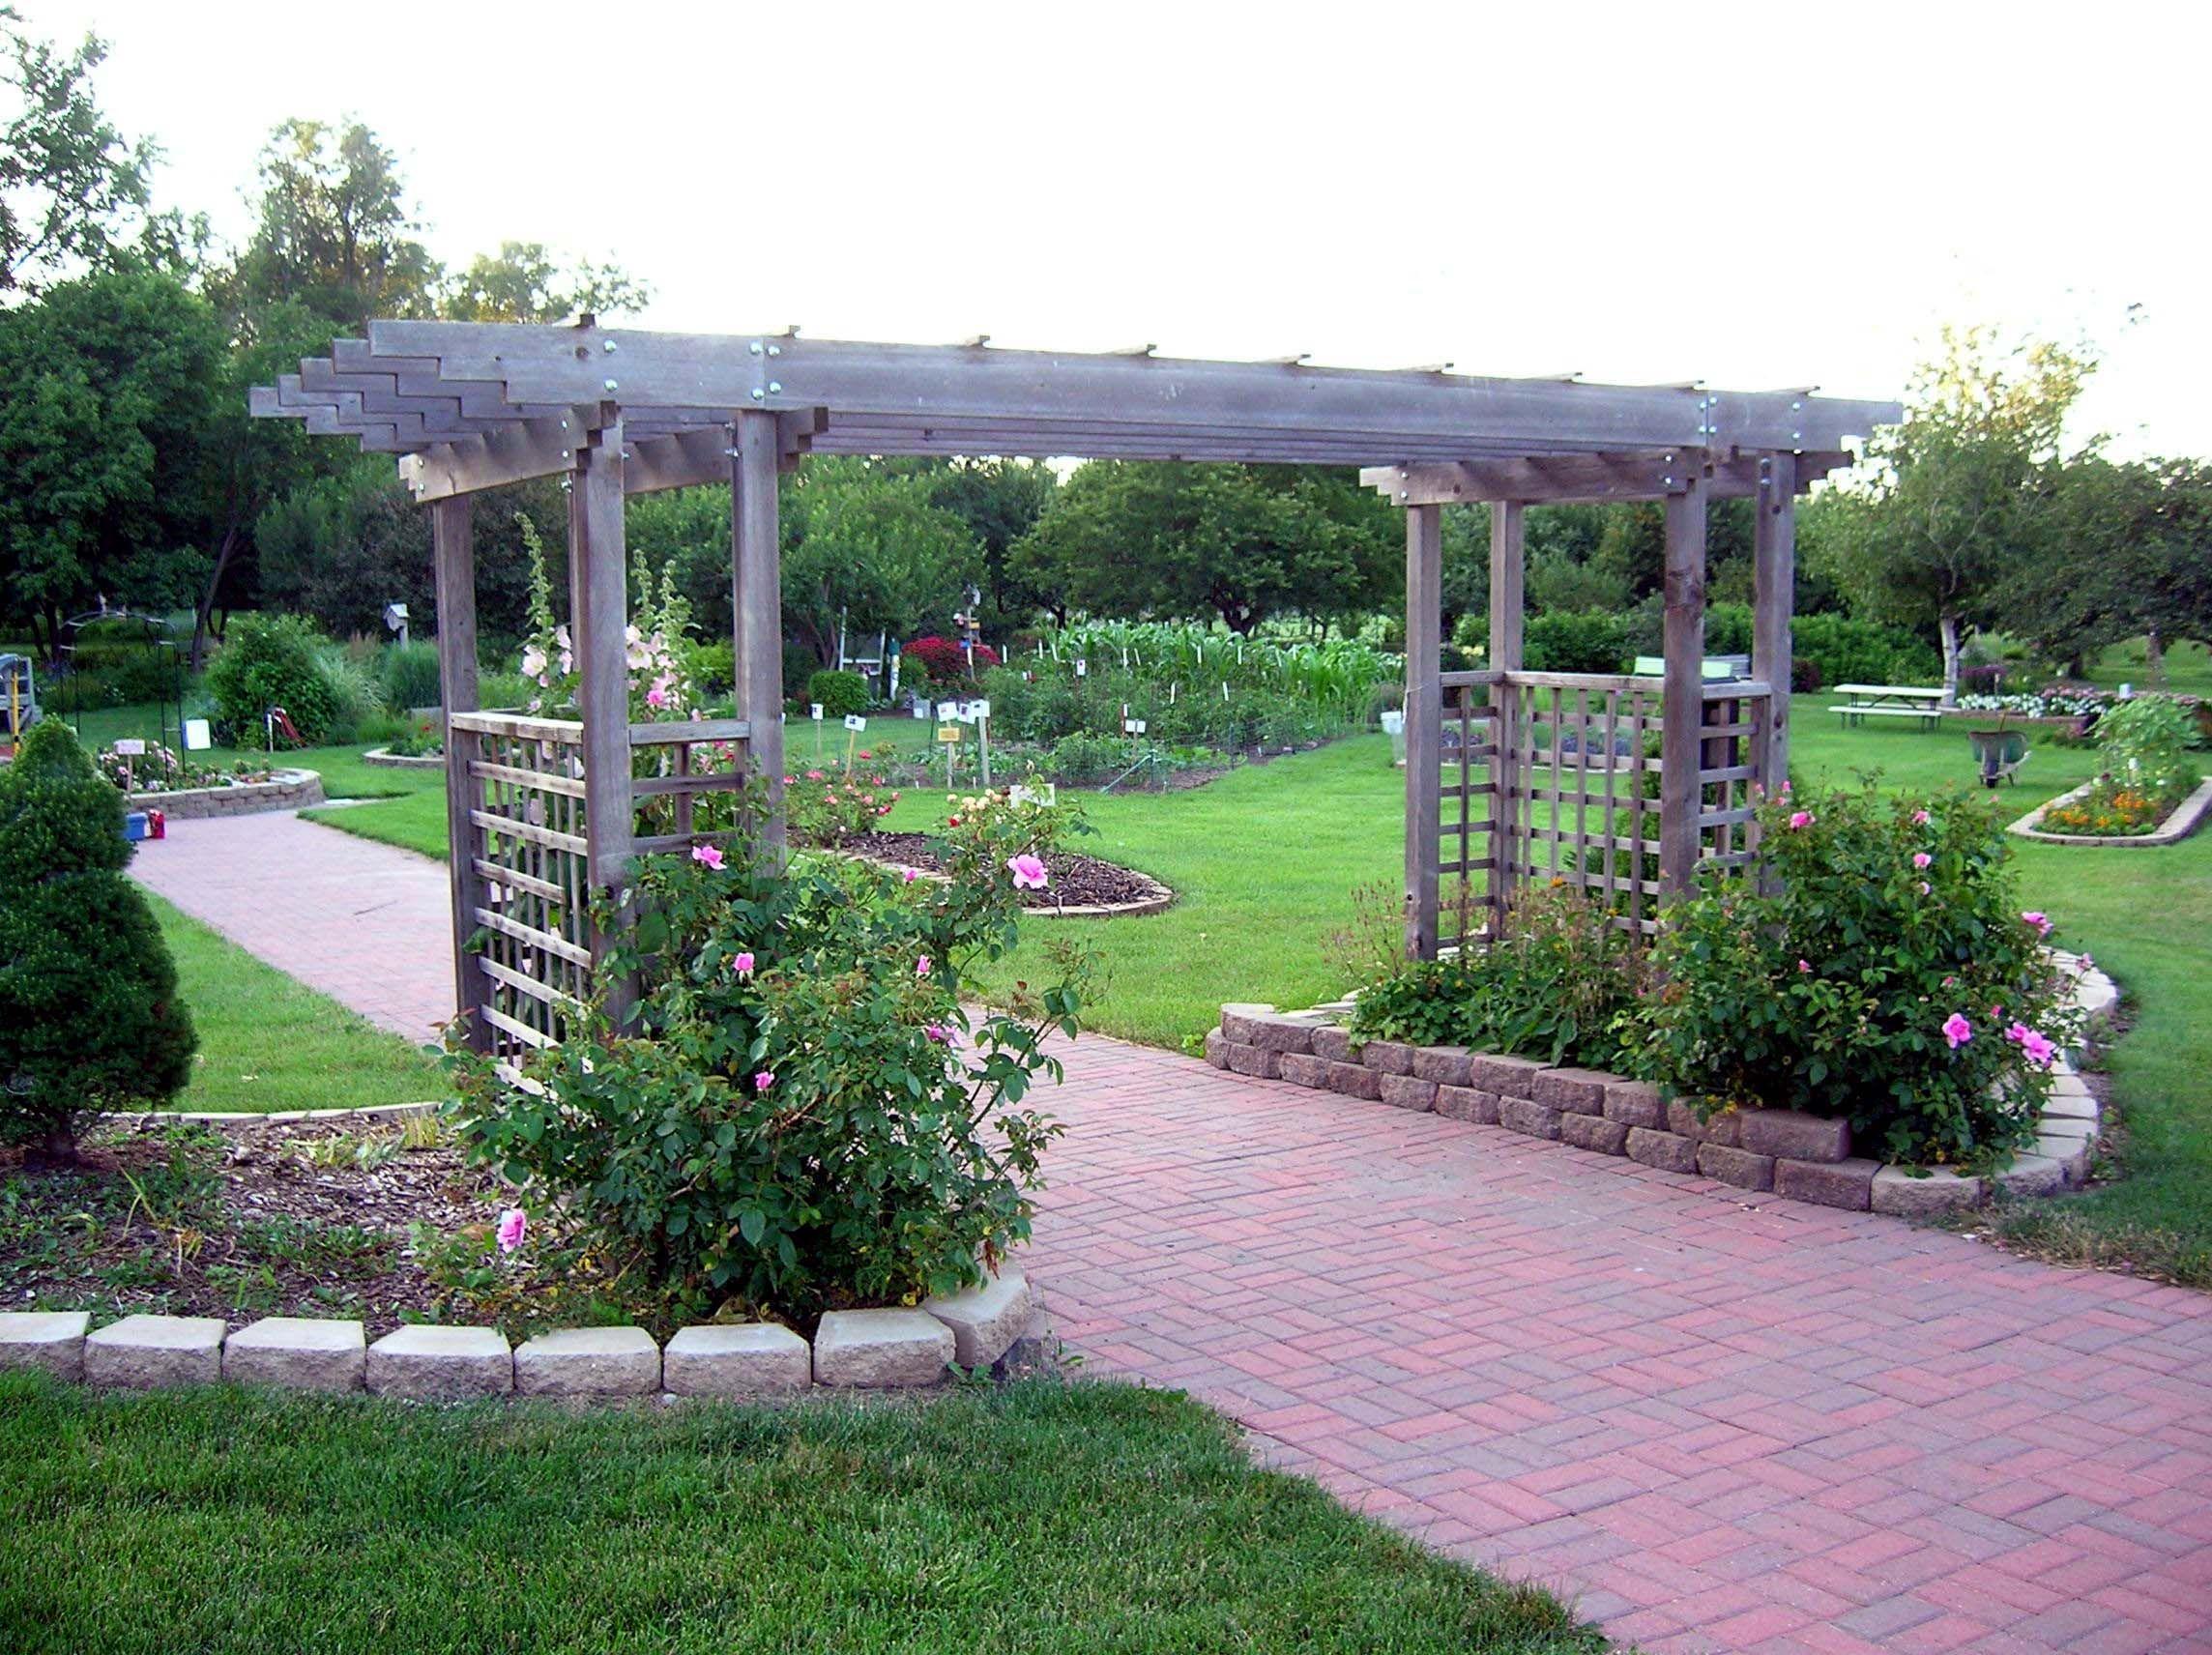 b82e3ba64c58bb018cb12e31acca2df1 - Better Homes And Gardens Test Garden Des Moines Iowa